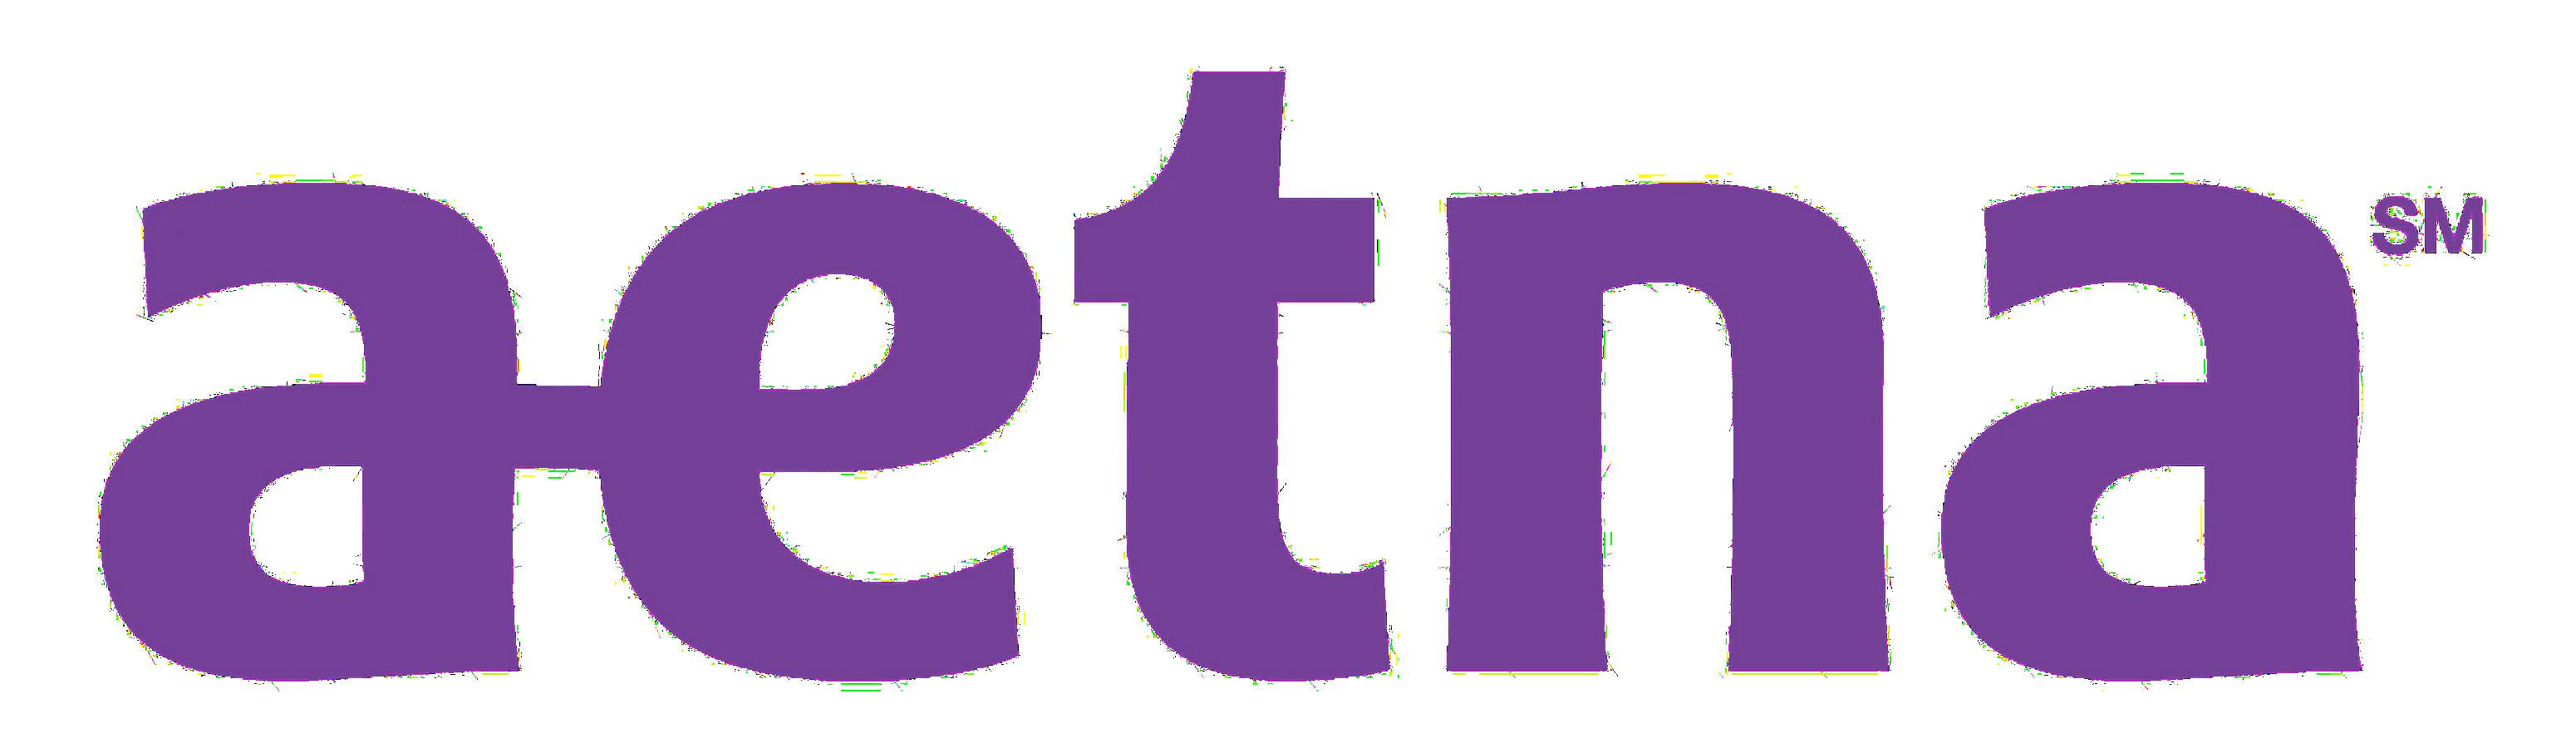 aetna logo png image purepng free transparent cc0 png